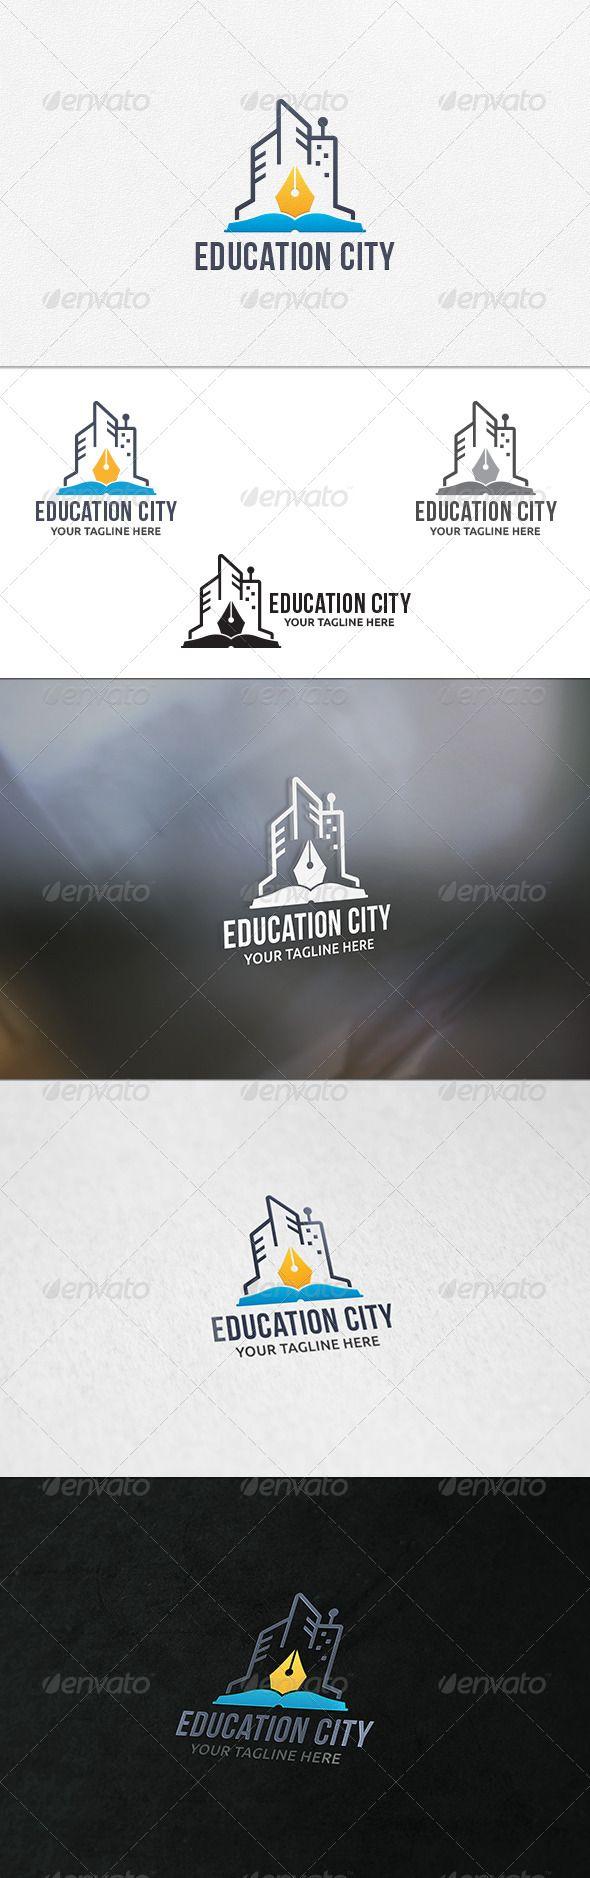 Education City  Logo Template — Vector EPS #city logo #city blogger • Available here → https://graphicriver.net/item/education-city-logo-template/7285598?ref=pxcr